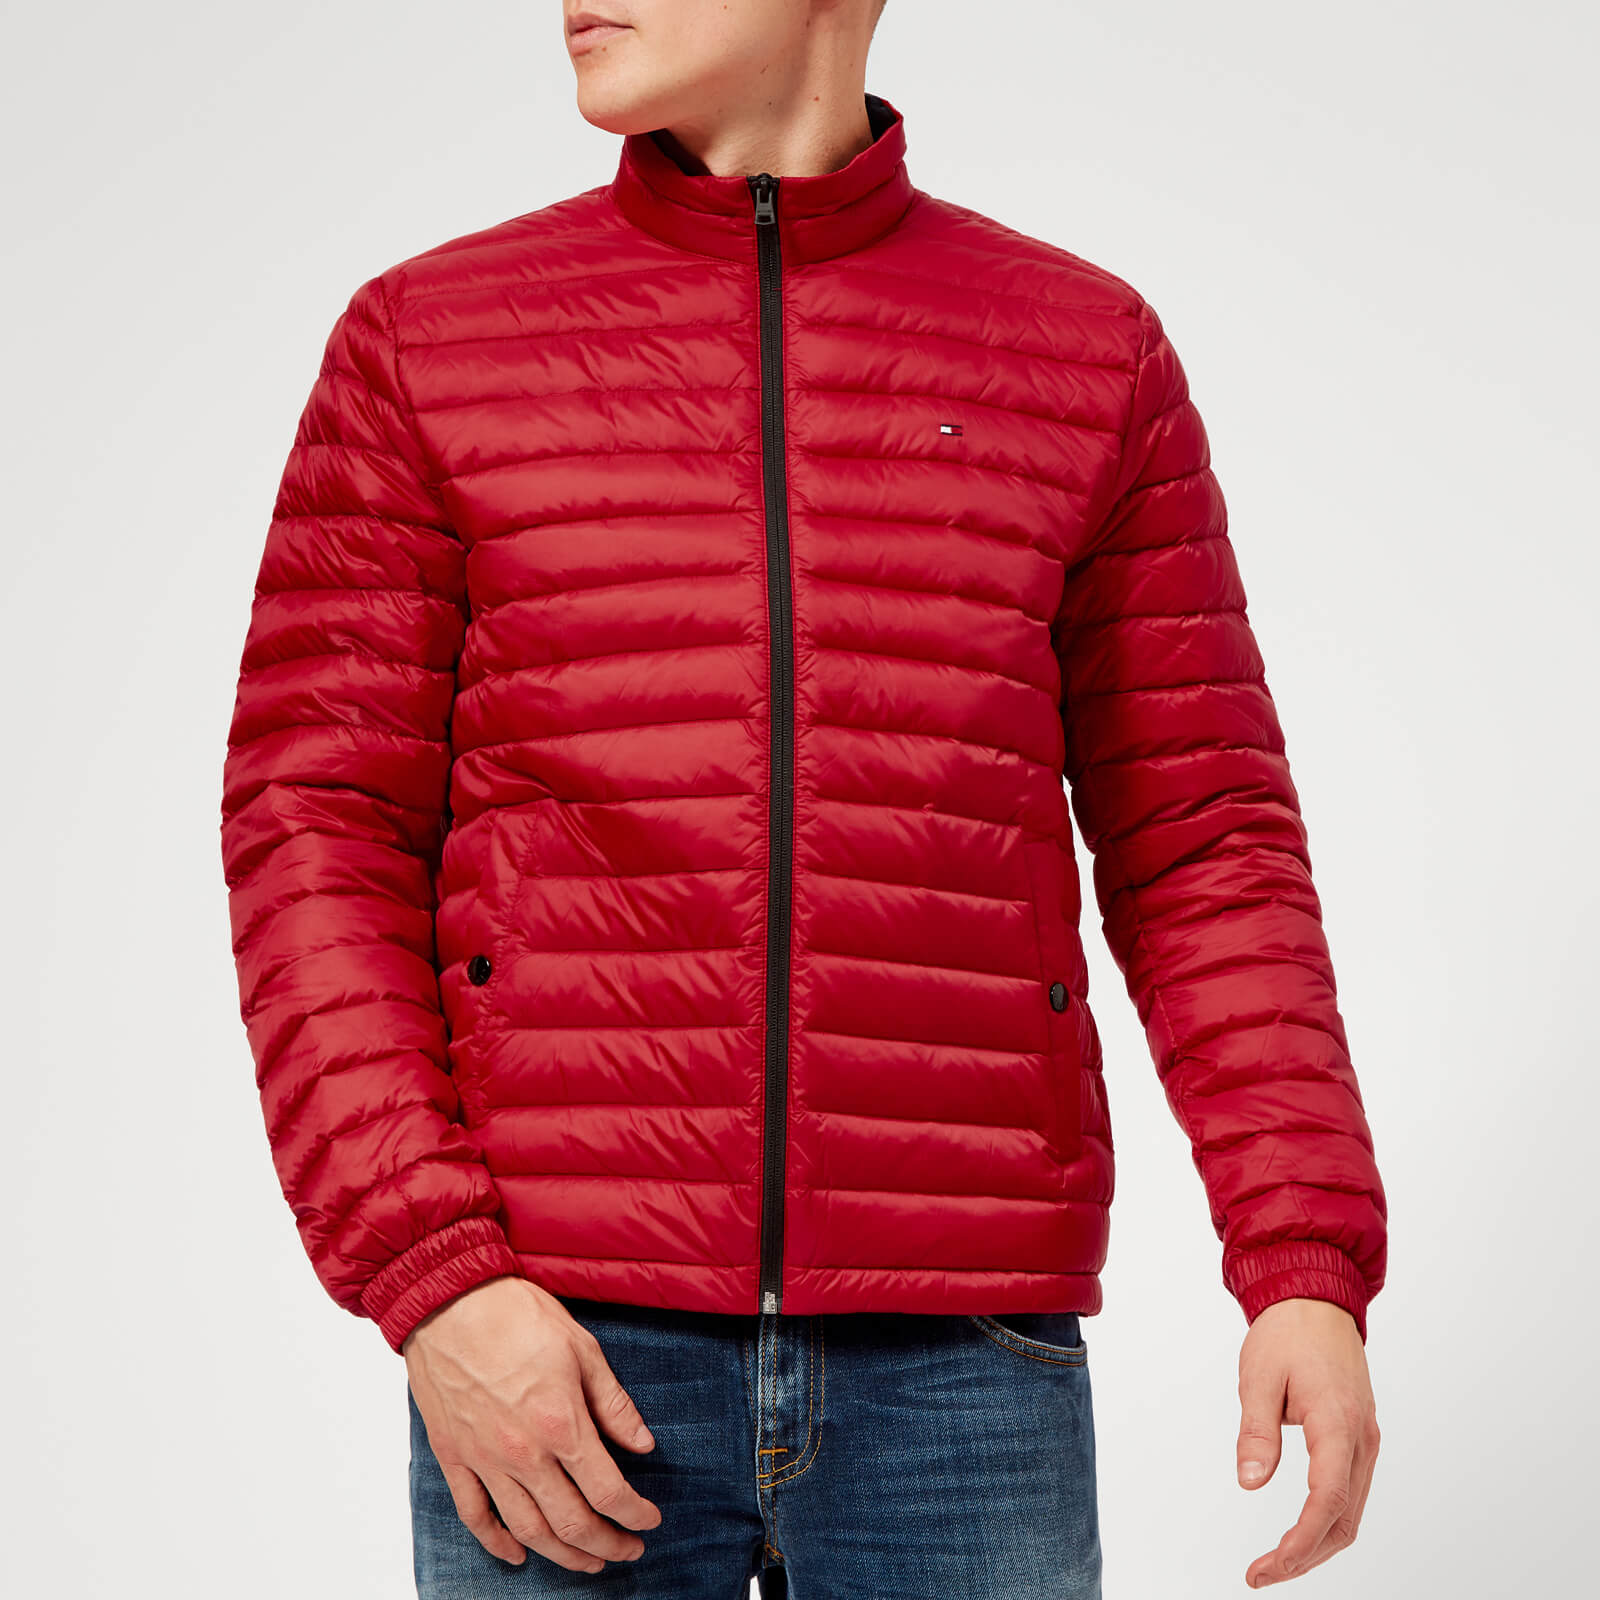 1c2f37823 Tommy Hilfiger Men's Lightweight Packable Down Jacket - Haute Red Clothing  | TheHut.com